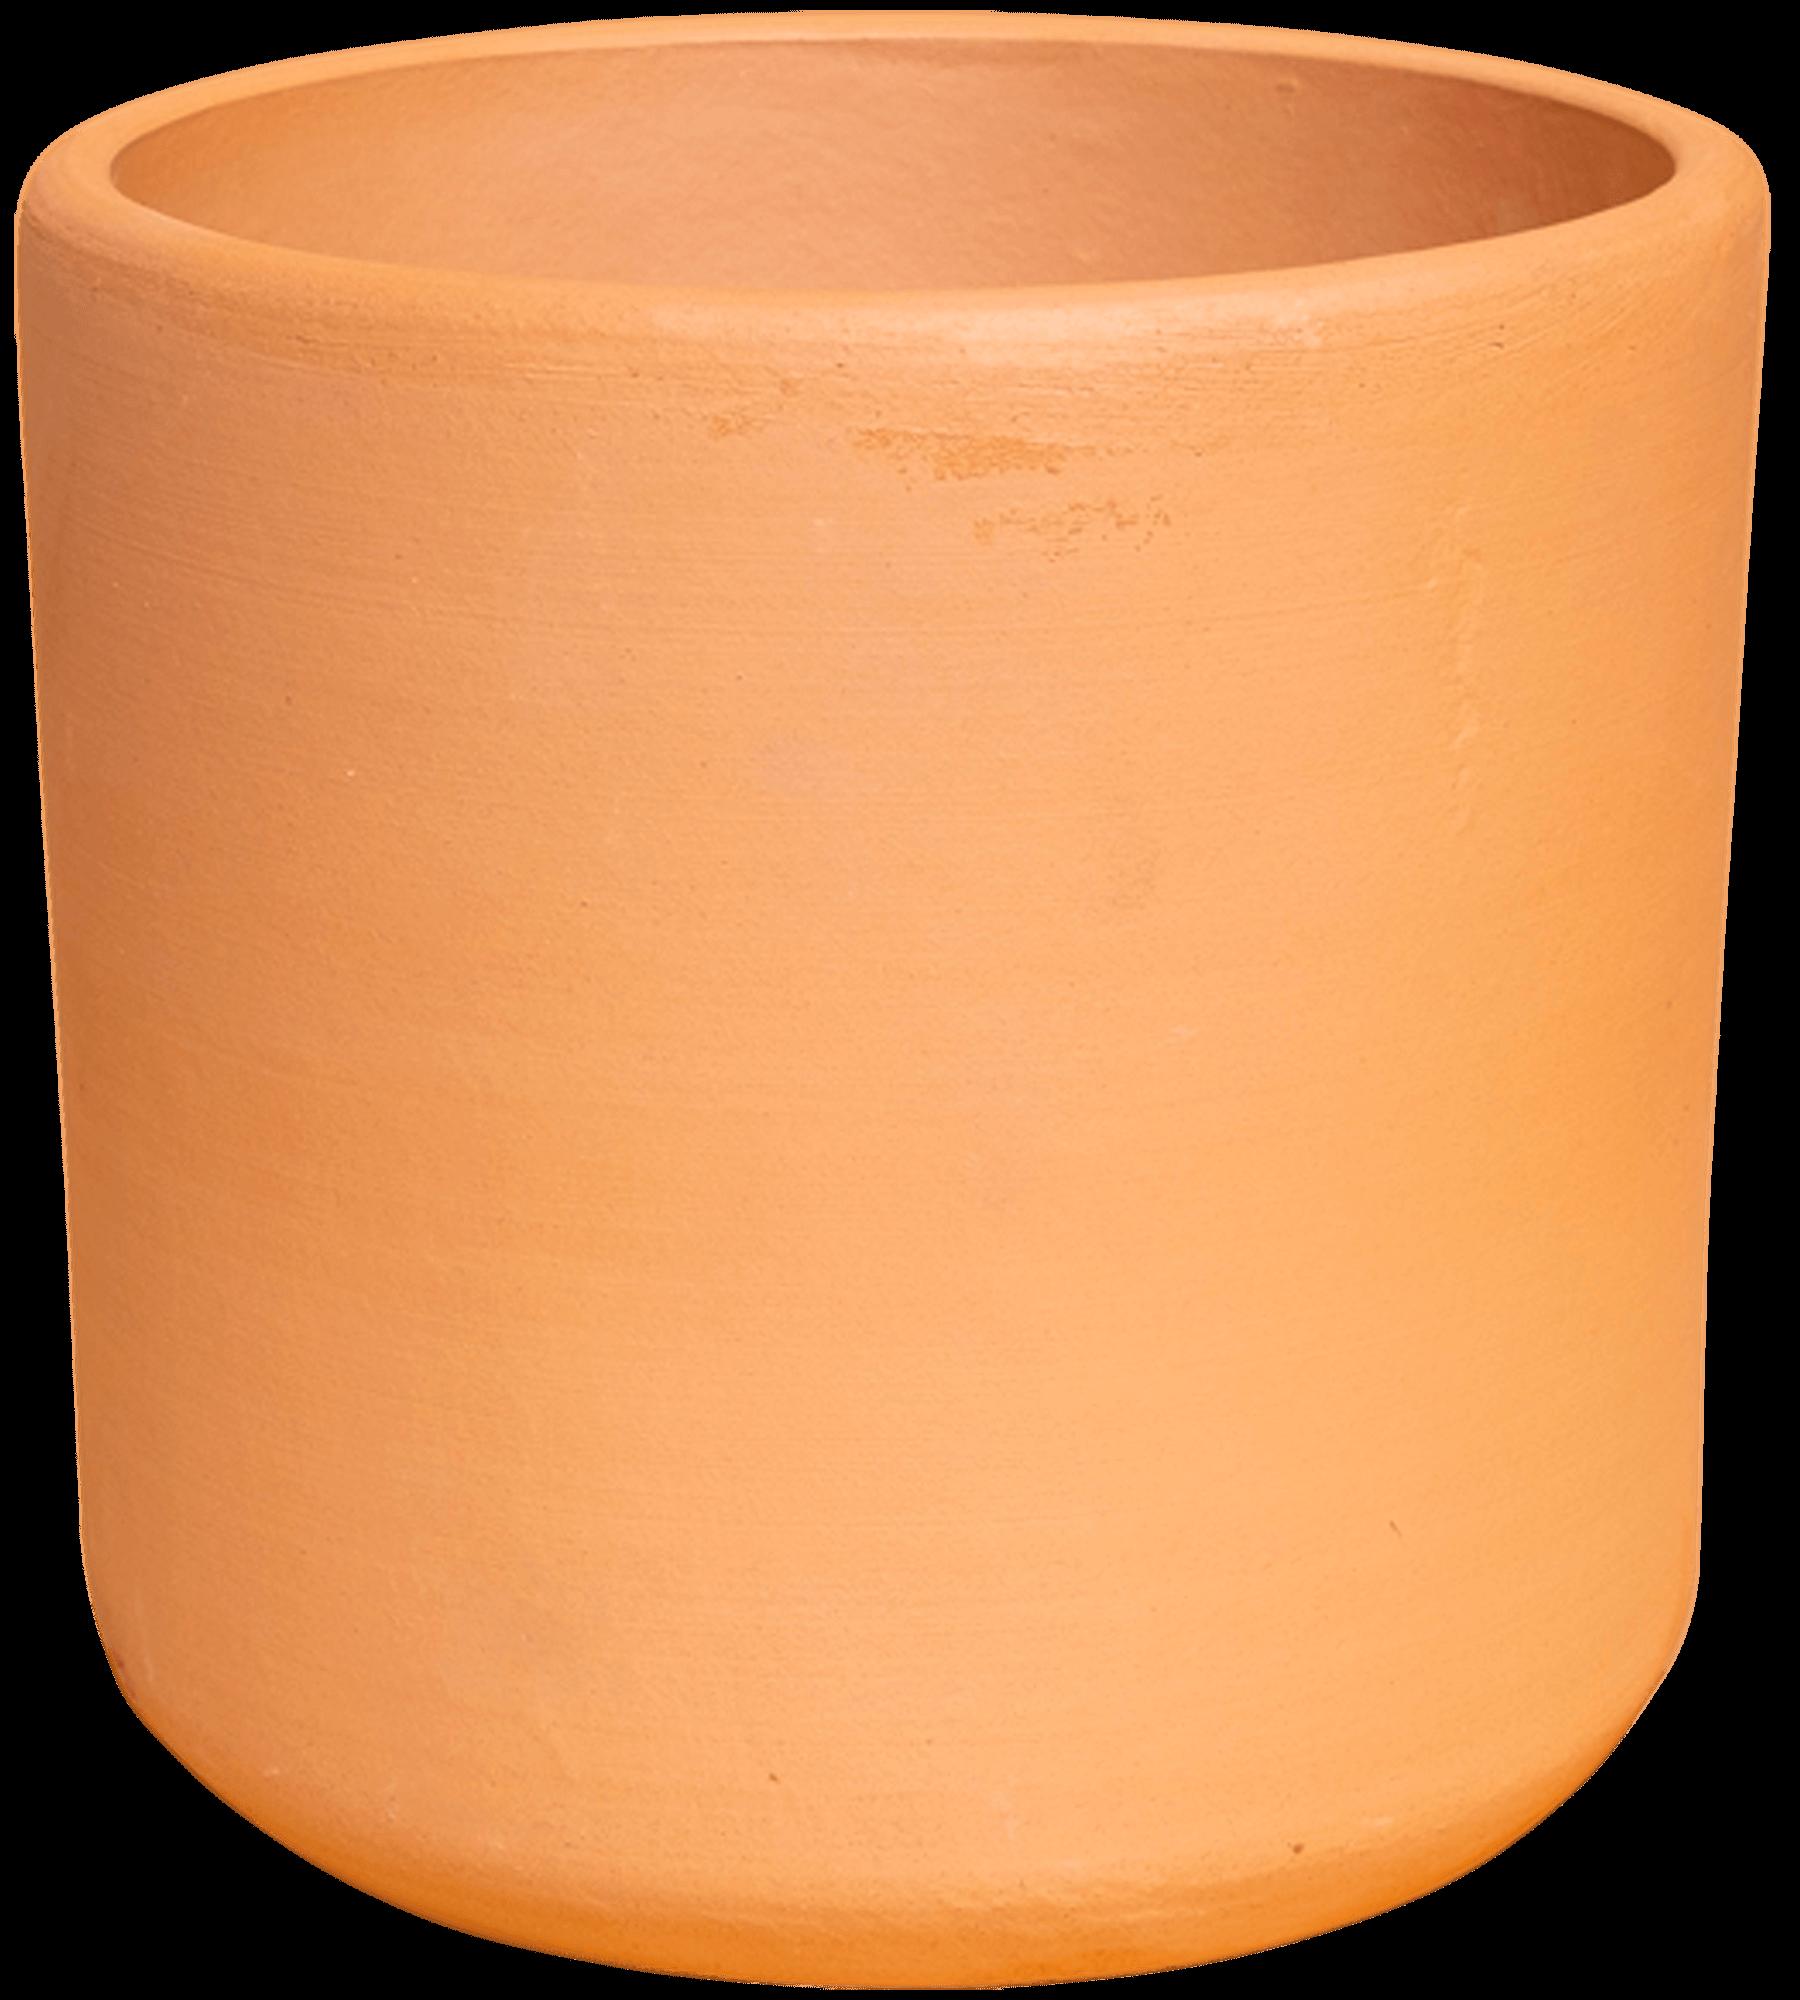 Buff Terra Cylinder Planter 6